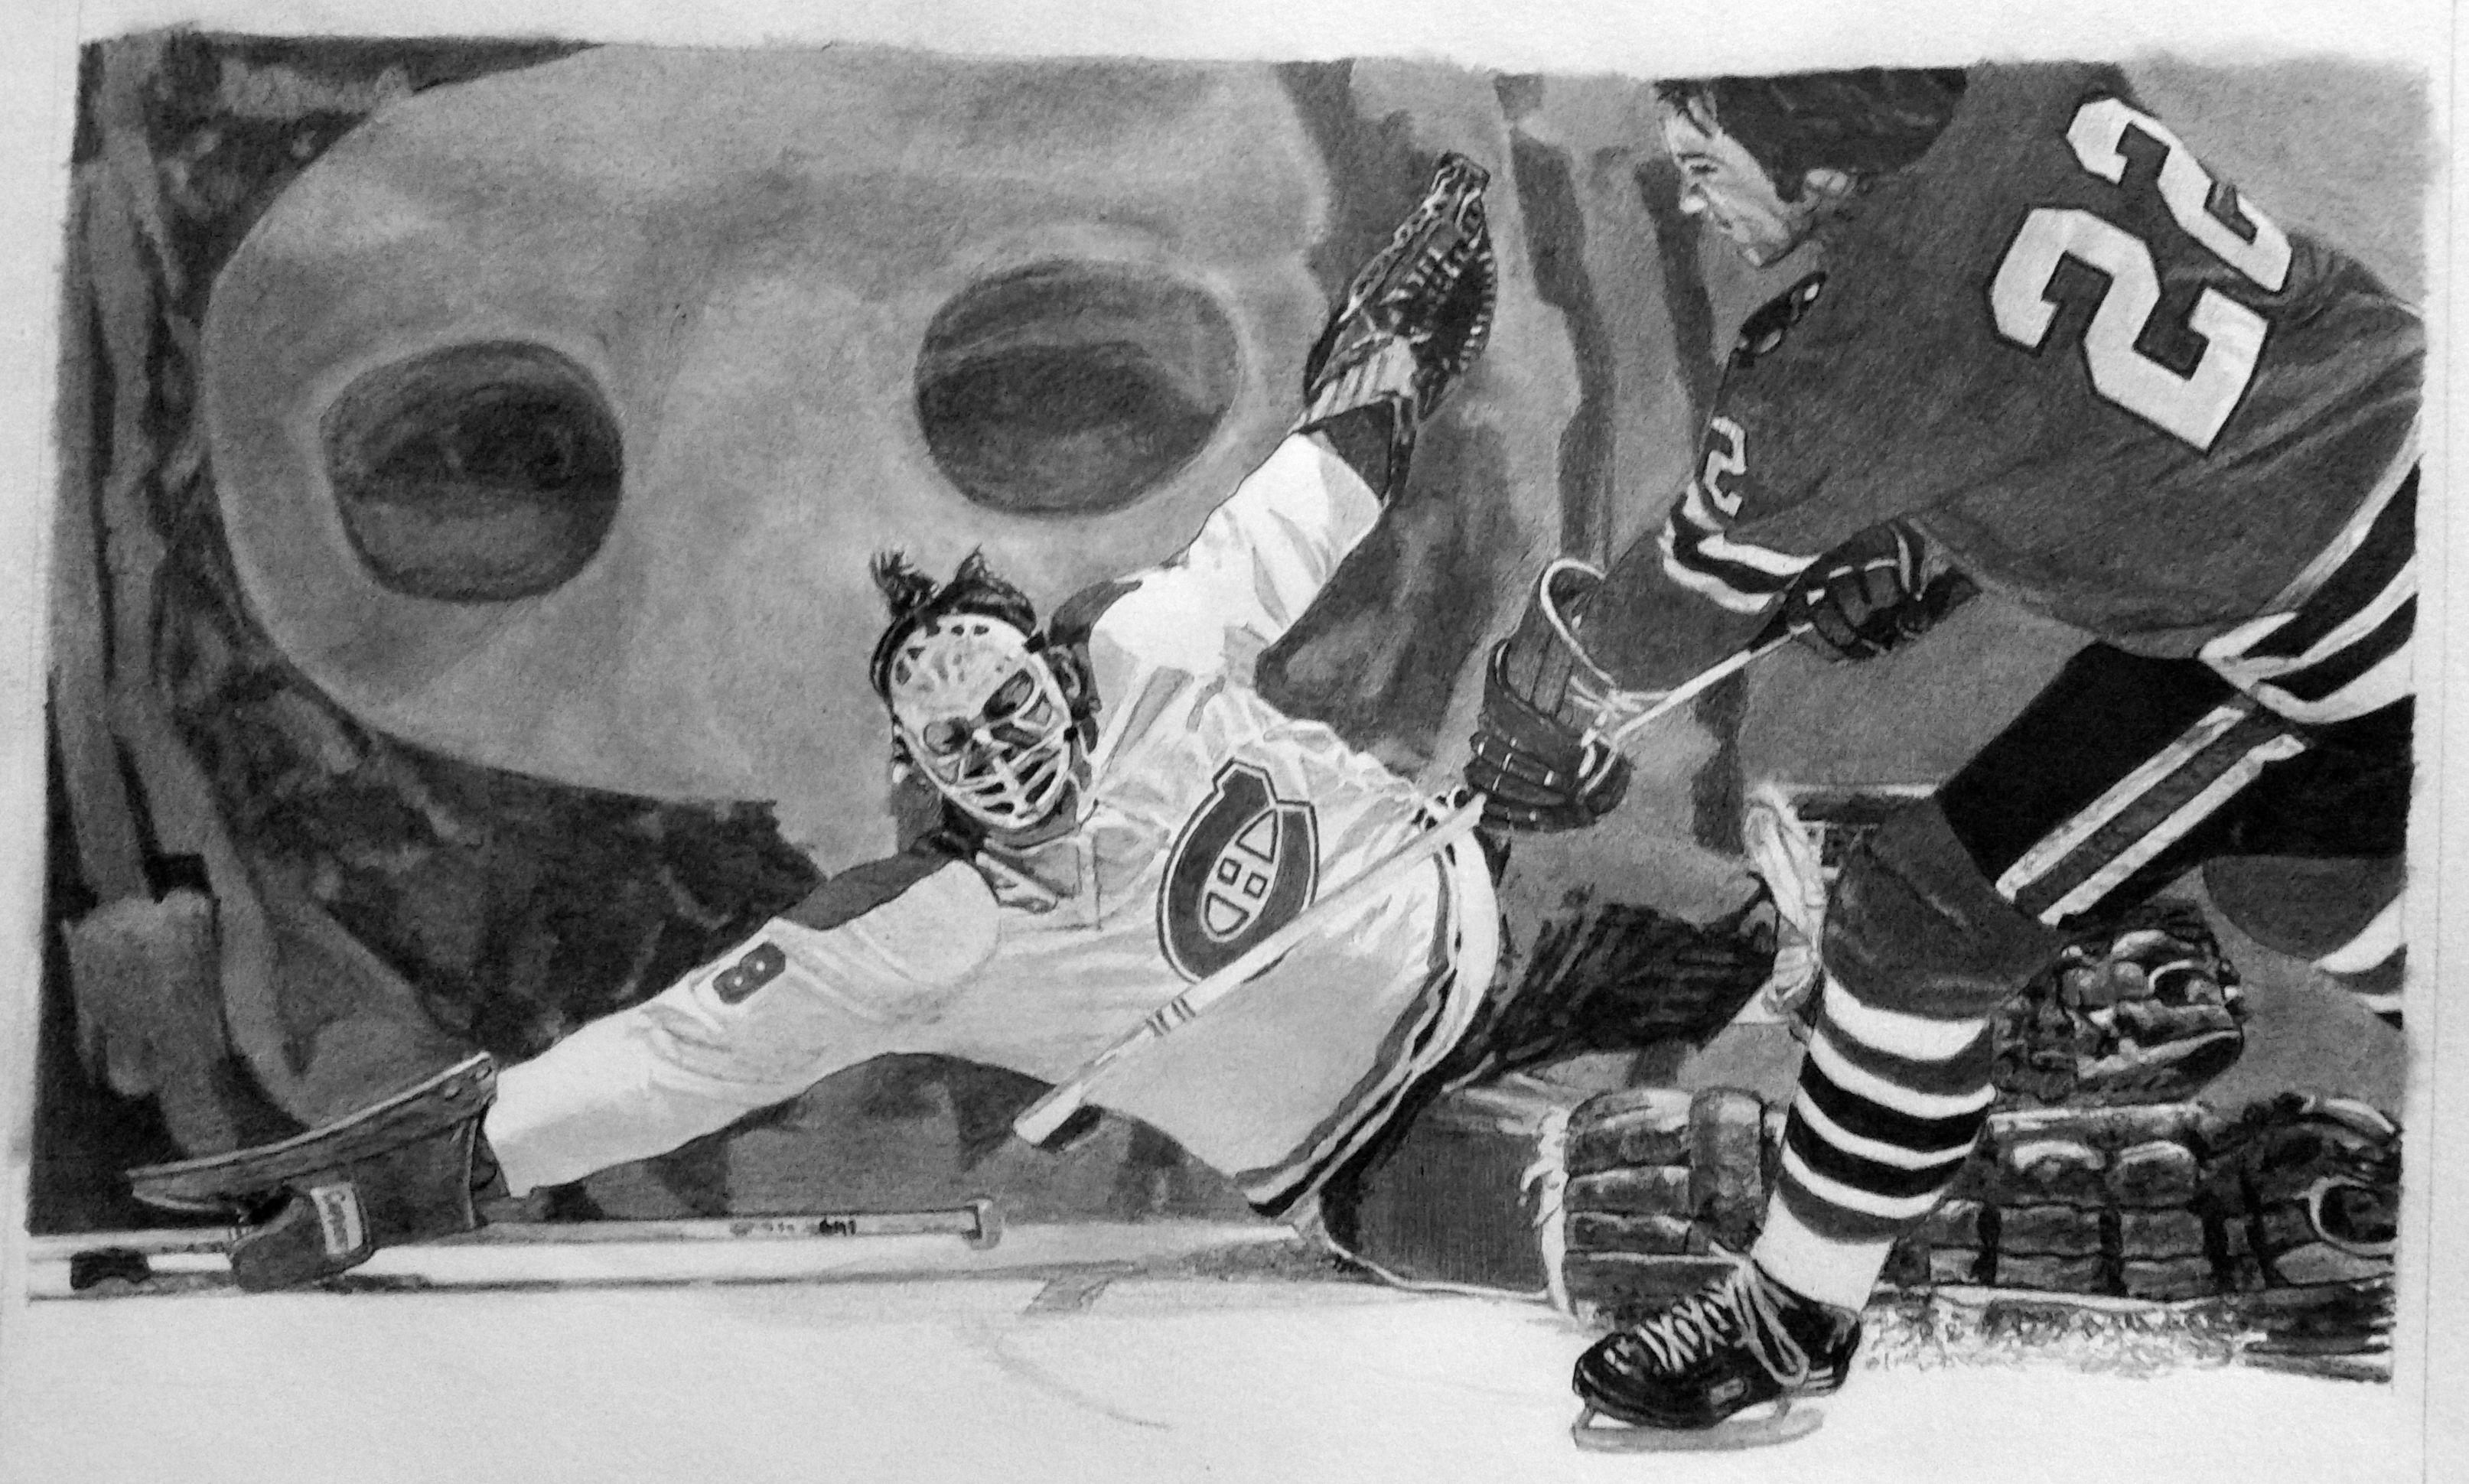 Hockey Art Ken Dryden Pencil Drawing Montreal Canadiens Hockey Goalie Created By Artist Robb Scott Sports Art Sports Drawings Montreal Canadiens Hockey